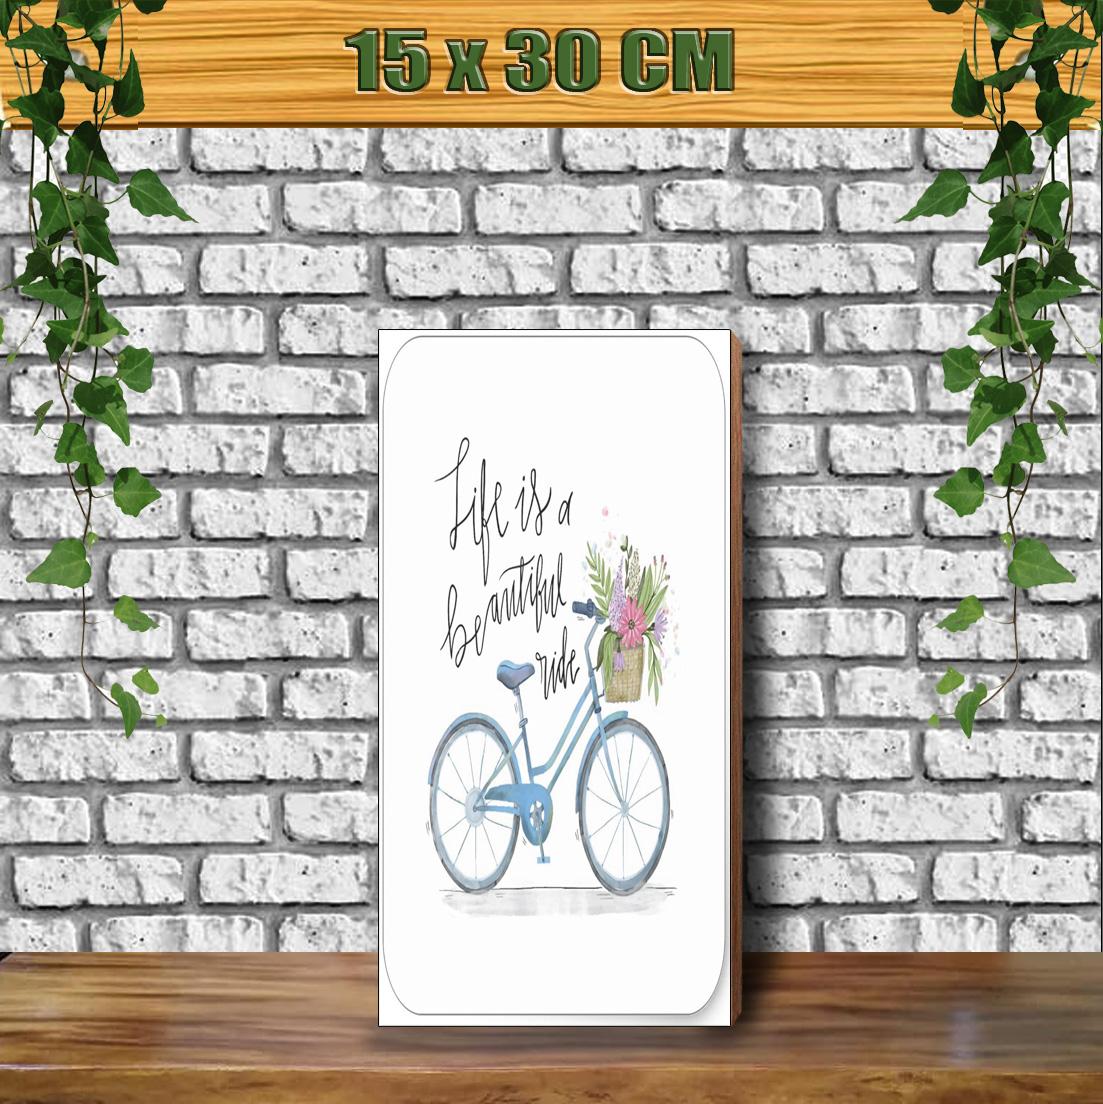 st2 – hiasan dinding hiasan ruang tamu dapur kamar tidur hiasan gantungan pintu wall decor minimalis bedroom